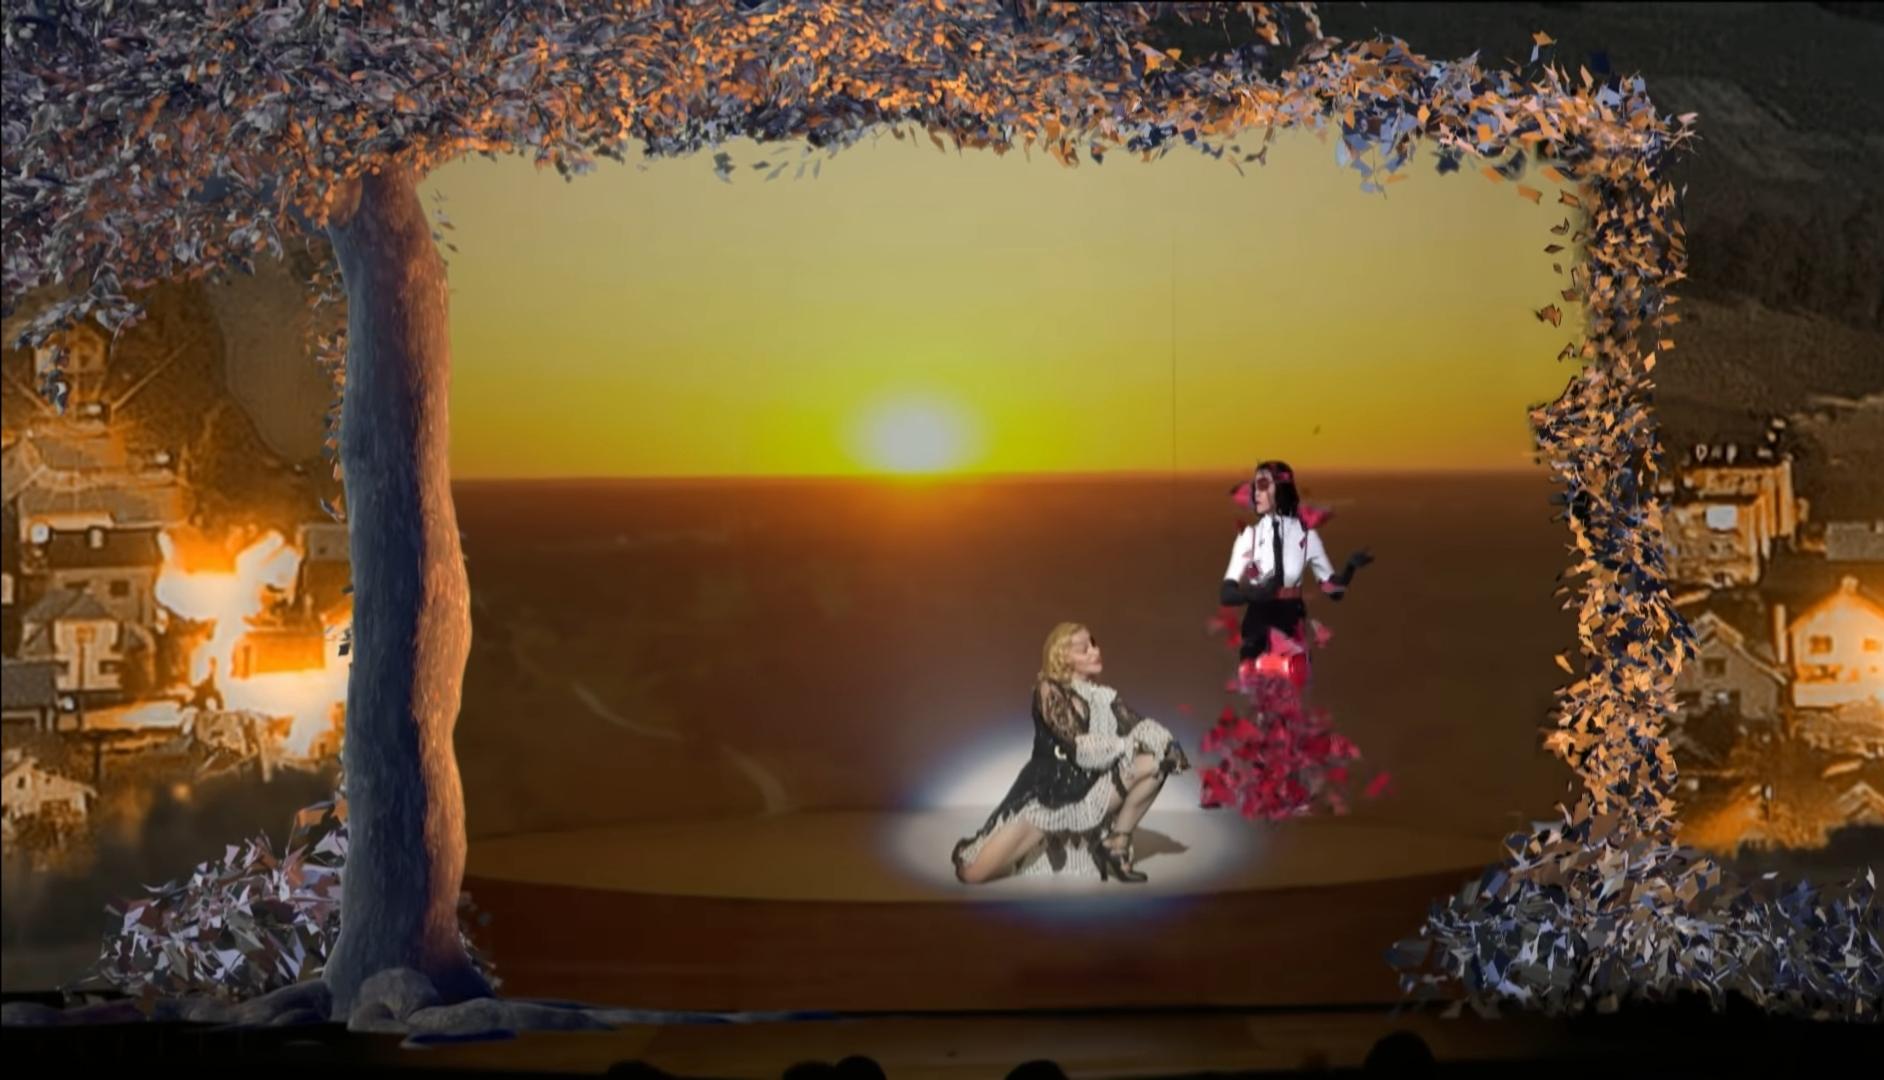 Courtesy of Vevo /Madonna performing  'Medellín' , also virtually dispersing into butterflies.